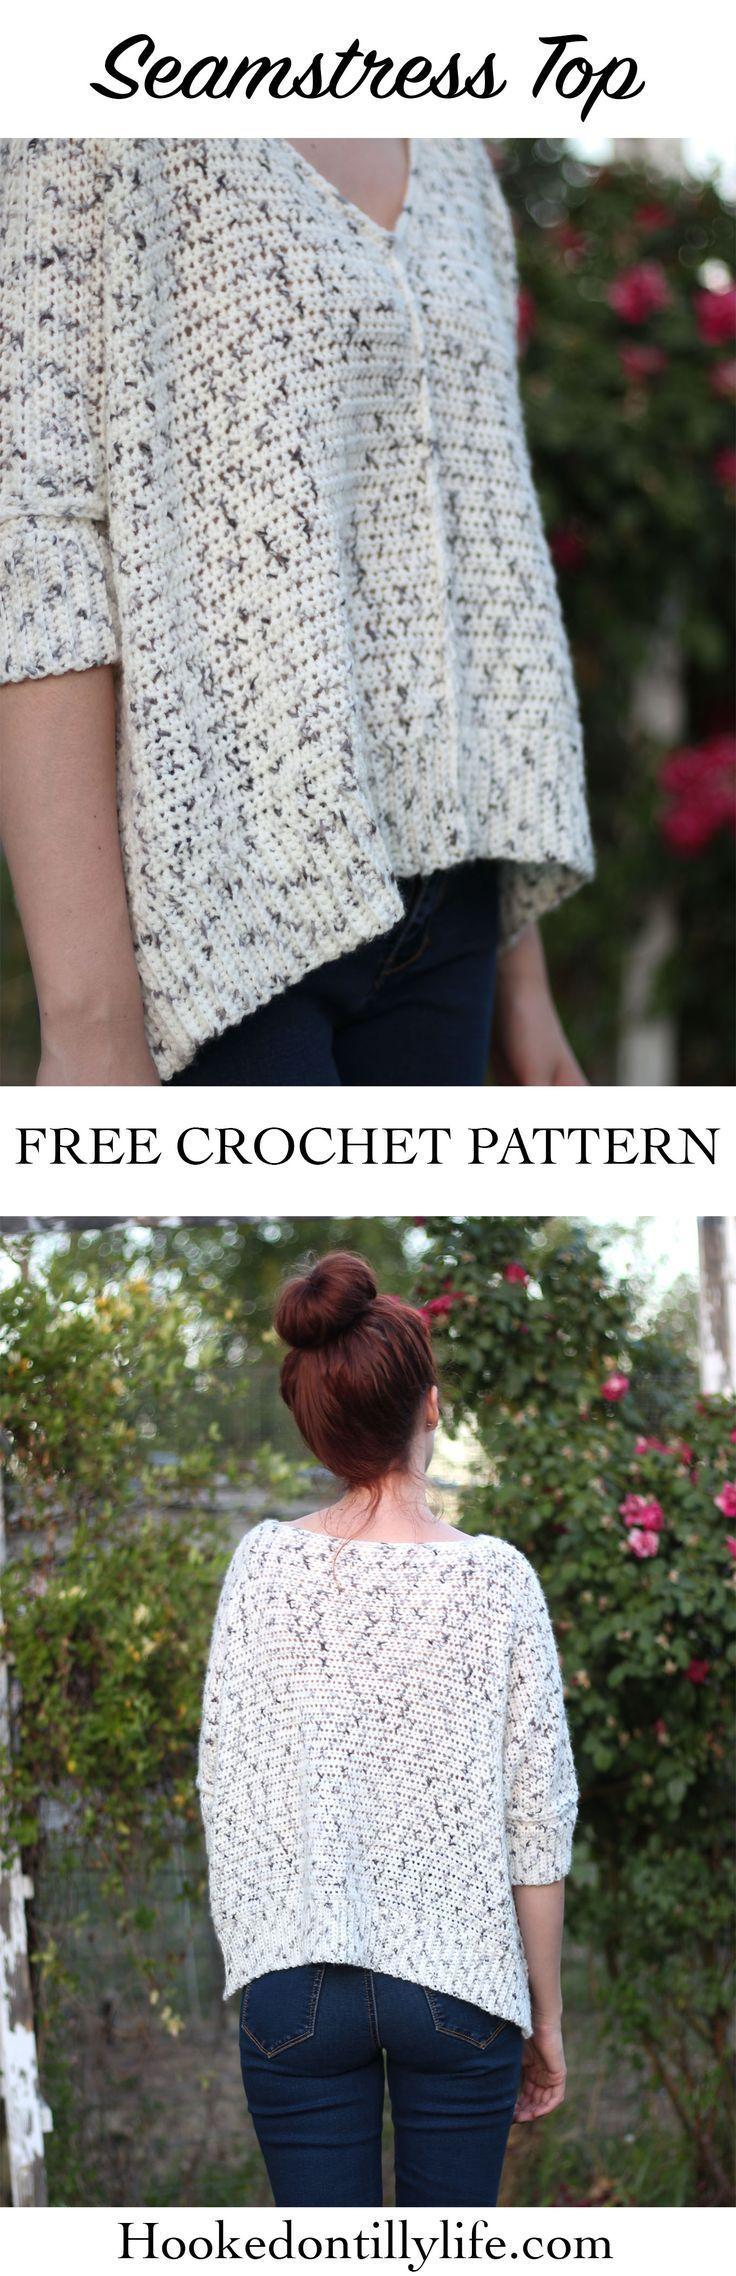 The Seamstress Top – Free Crochet Pattern